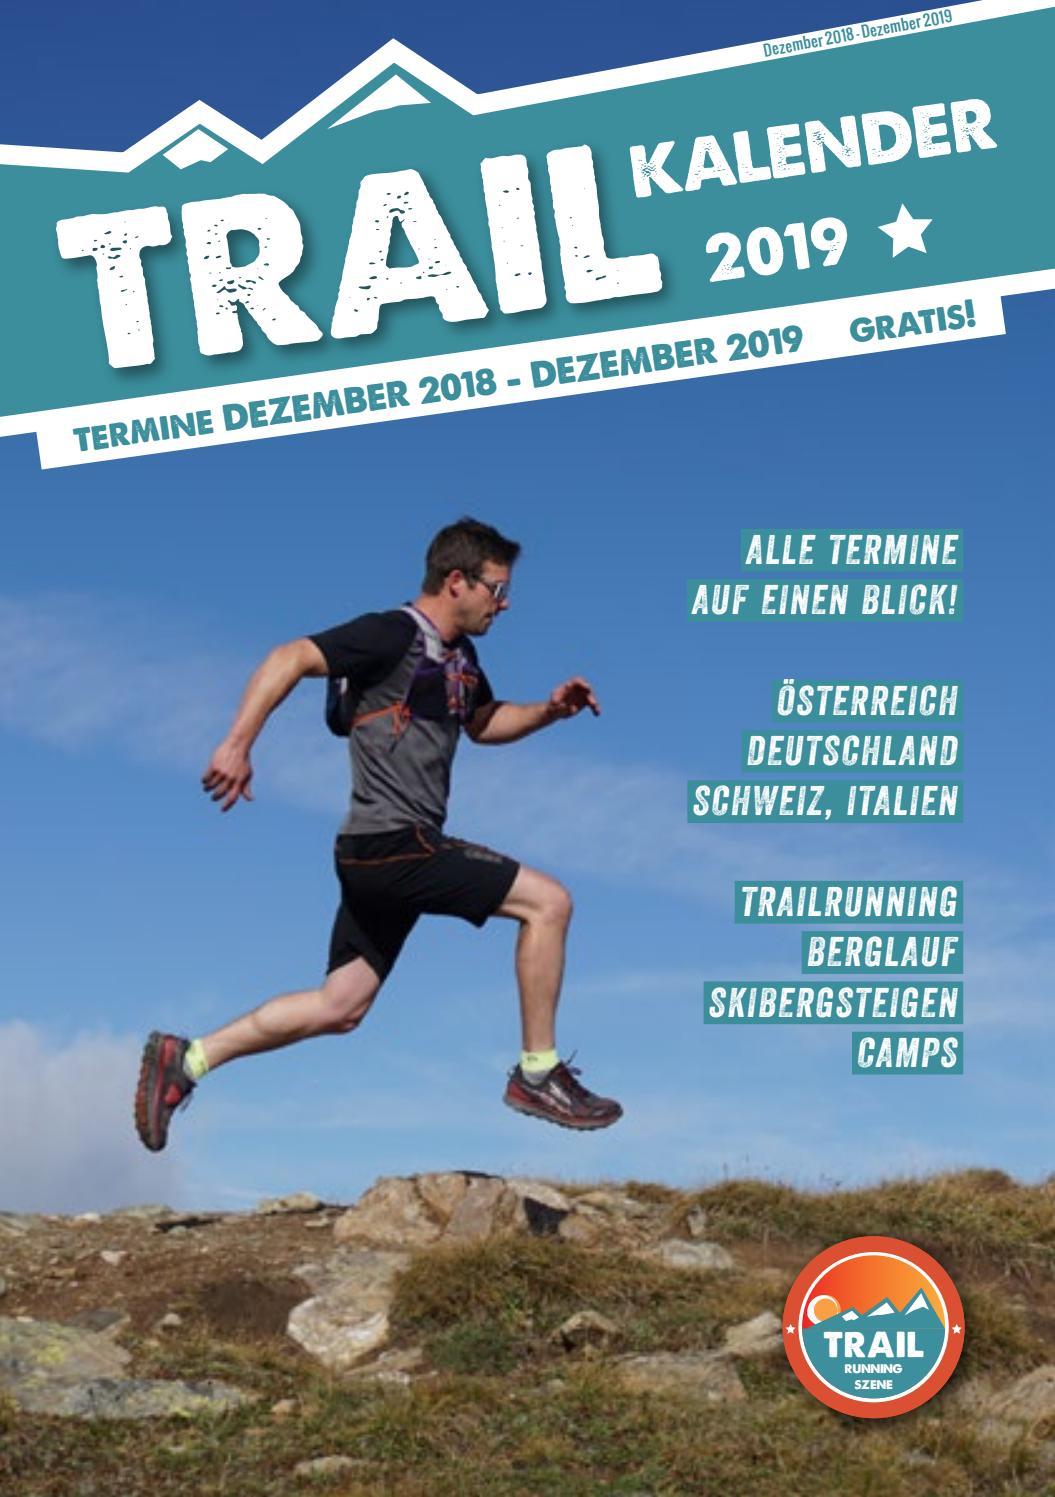 Trail Kalender 2019 by Trailrunning Szene issuu